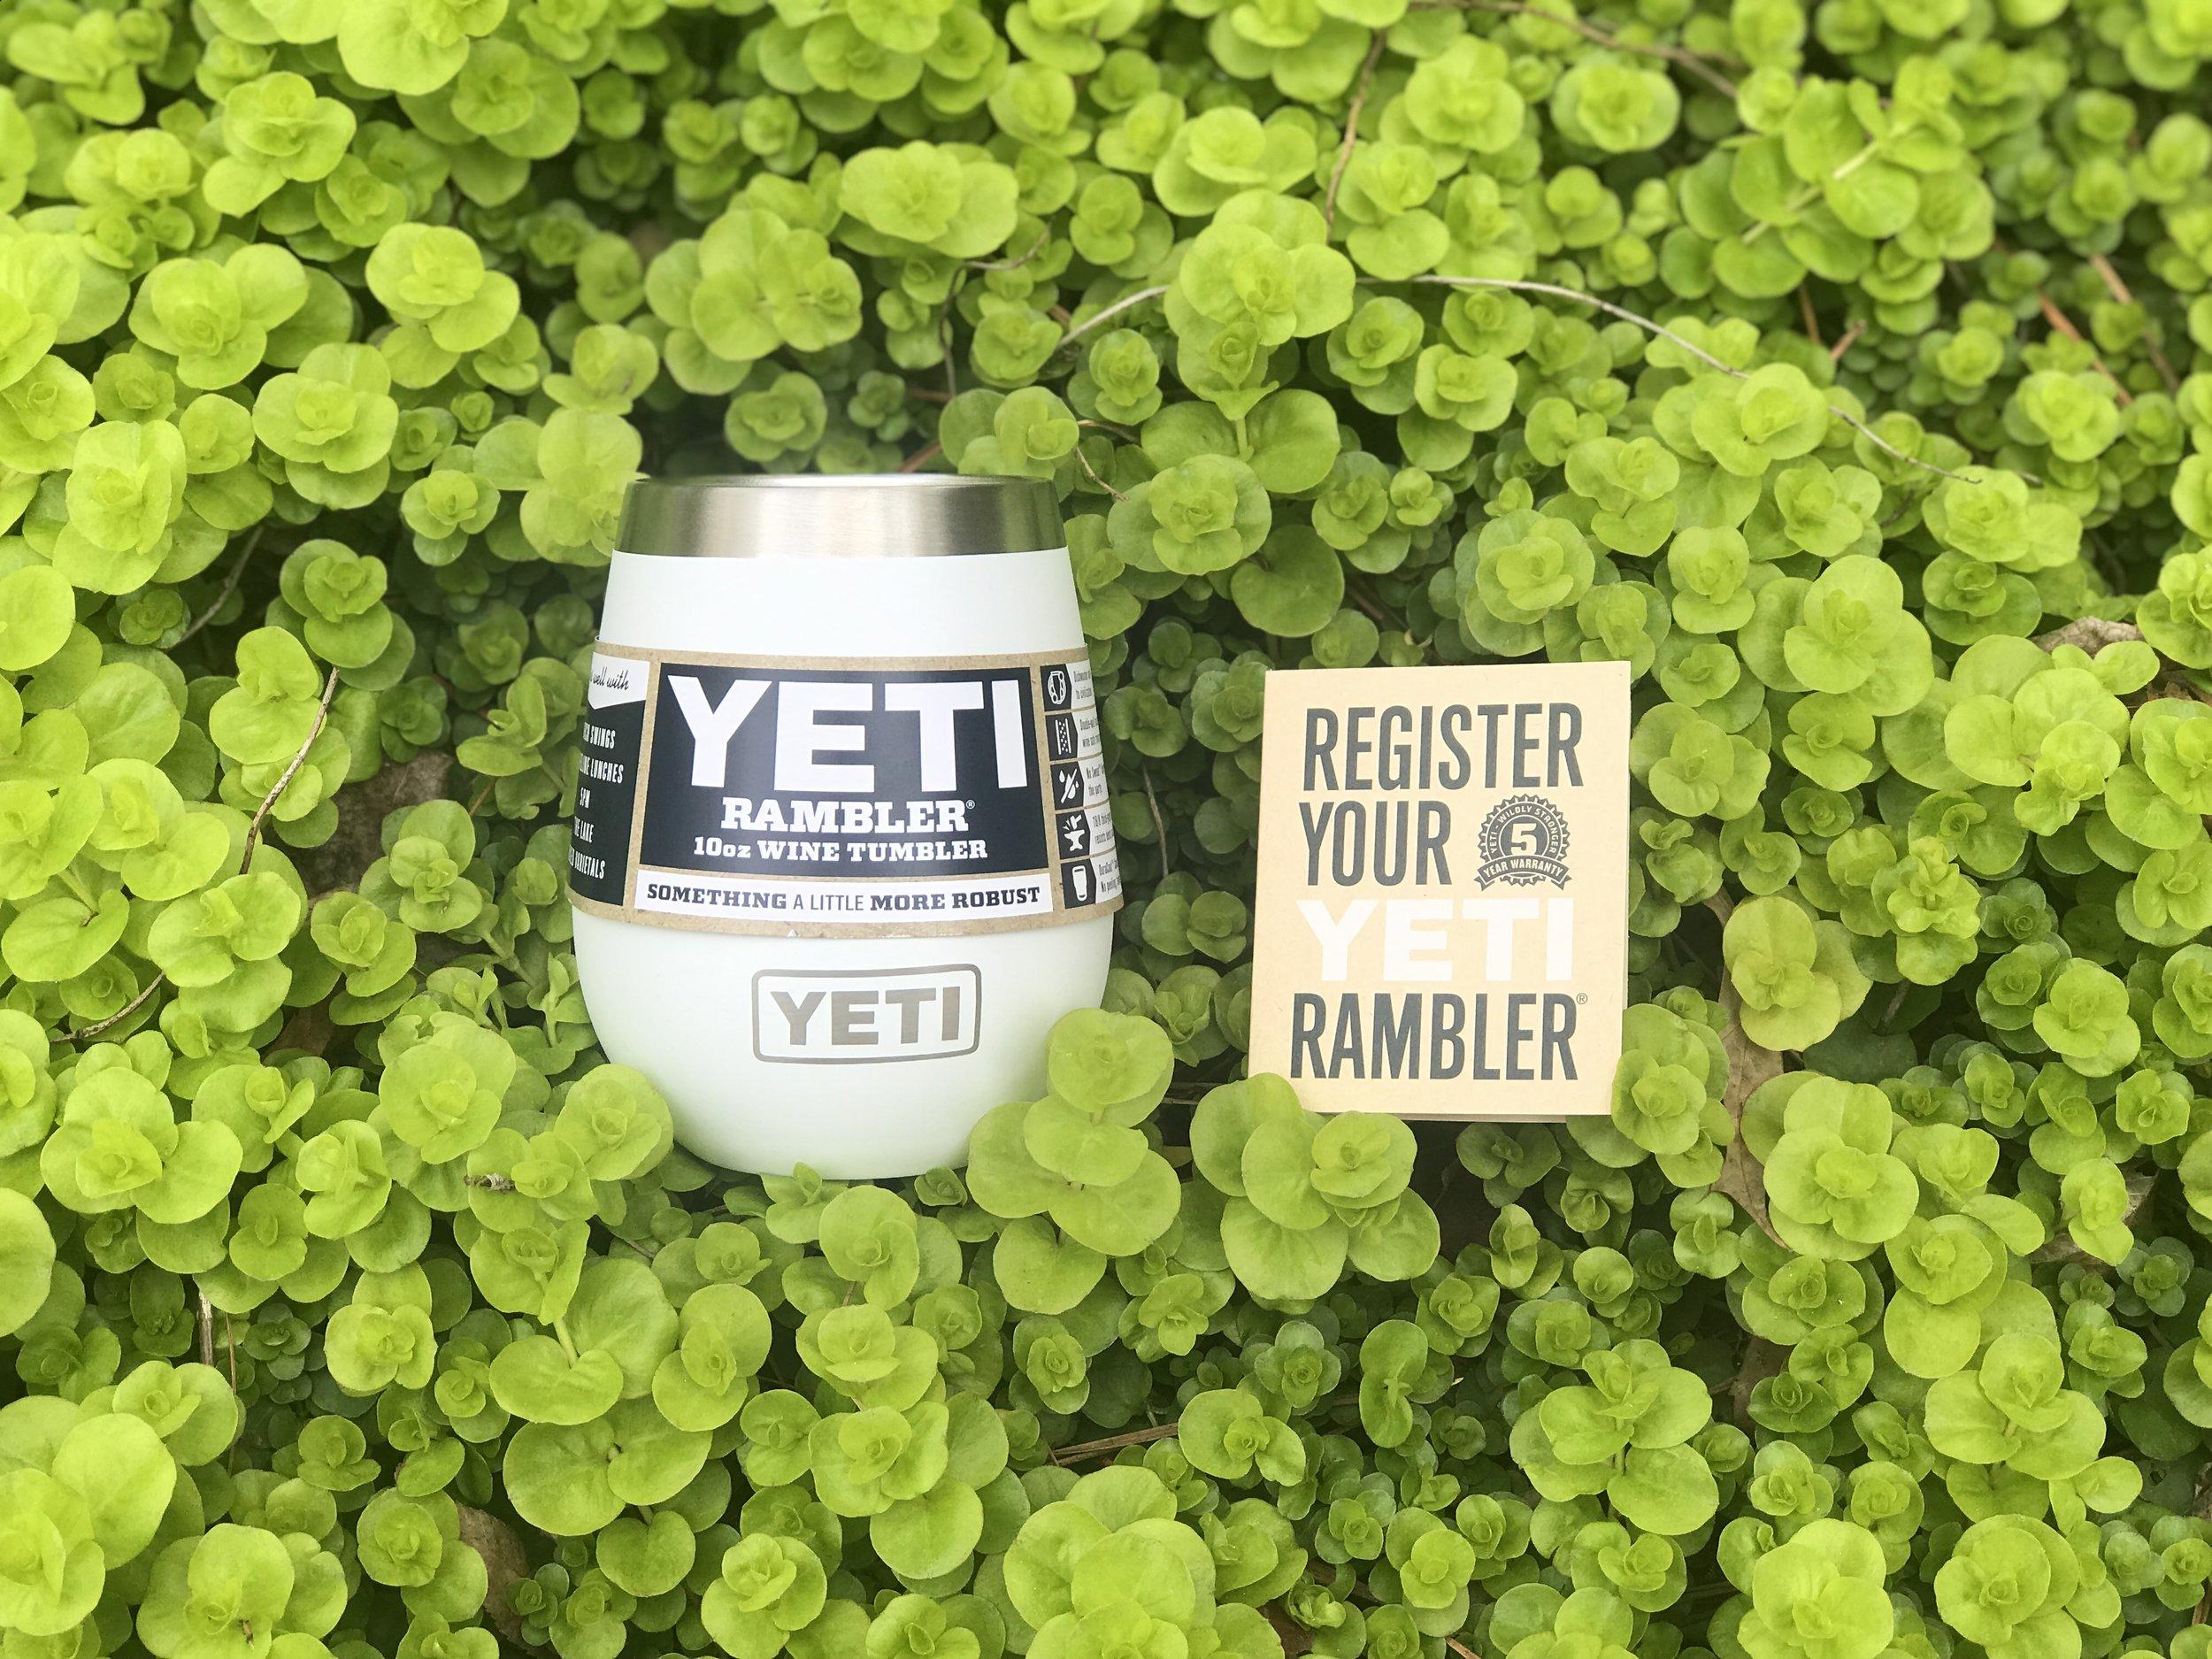 0212.  Yeti Rambler Insulated Wine Tumbler 2.jpeg